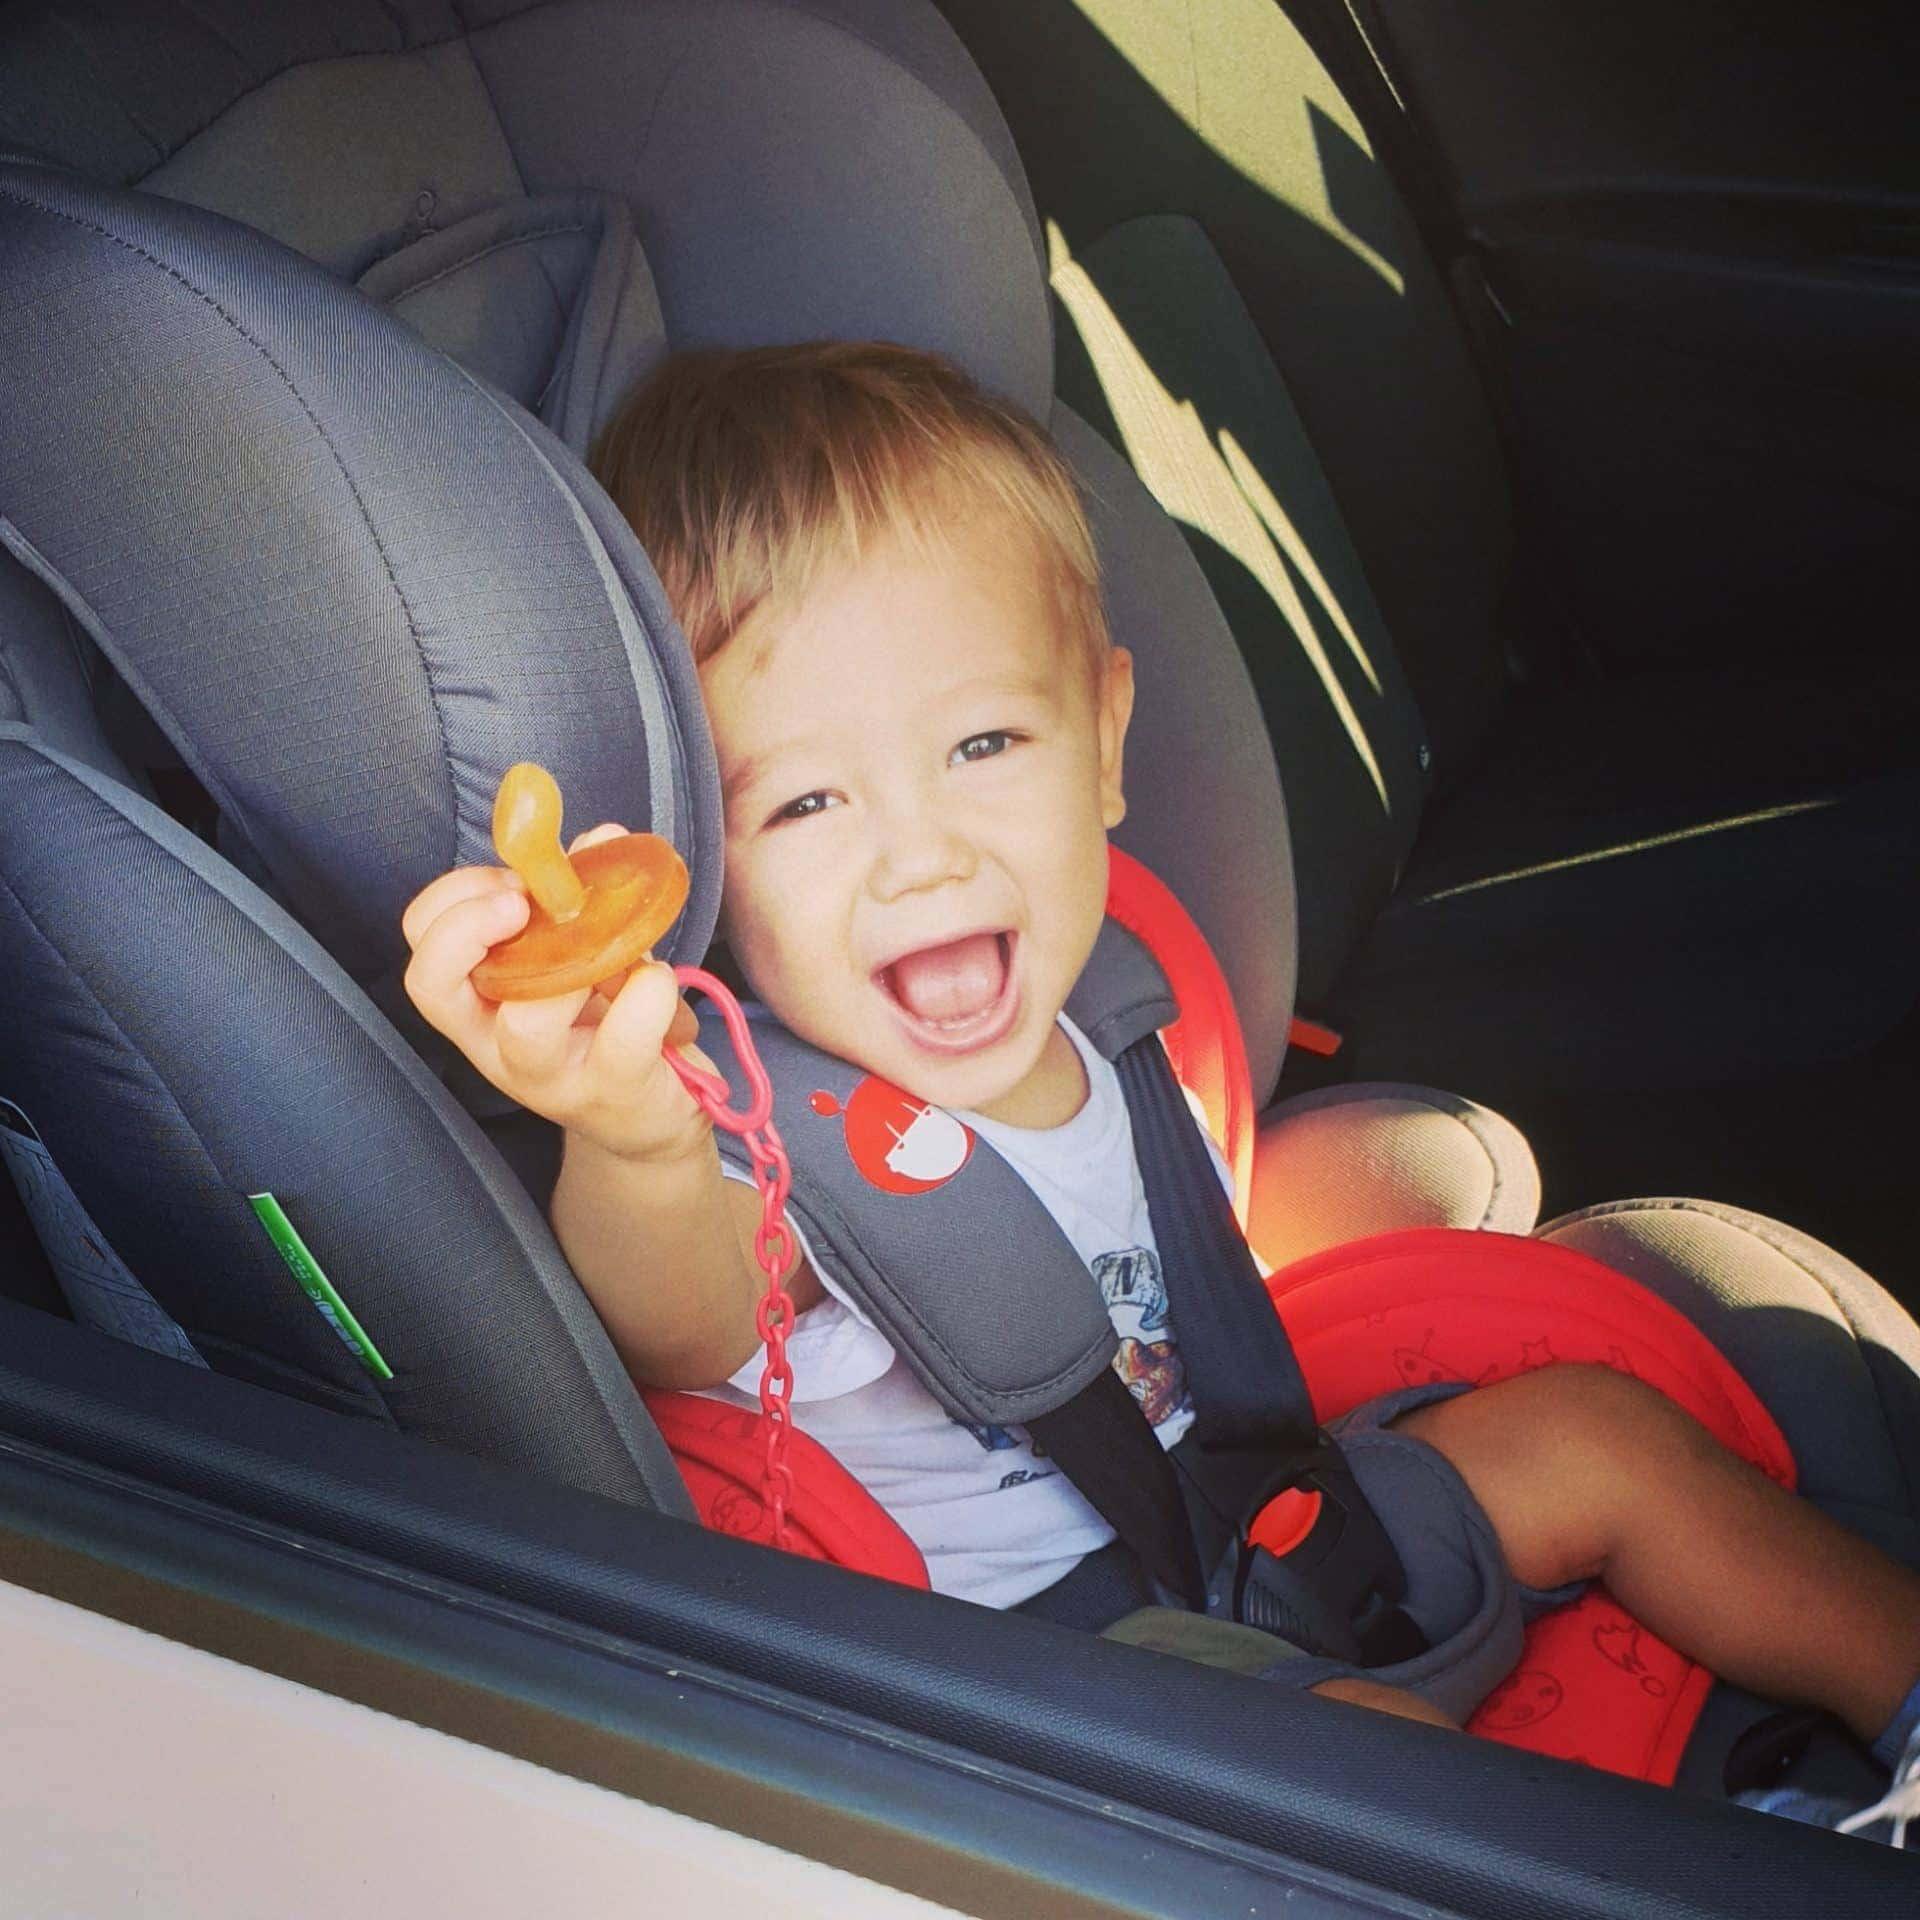 Aprende a pronunciar Image of a boy sitting in a child seat in a Zity car